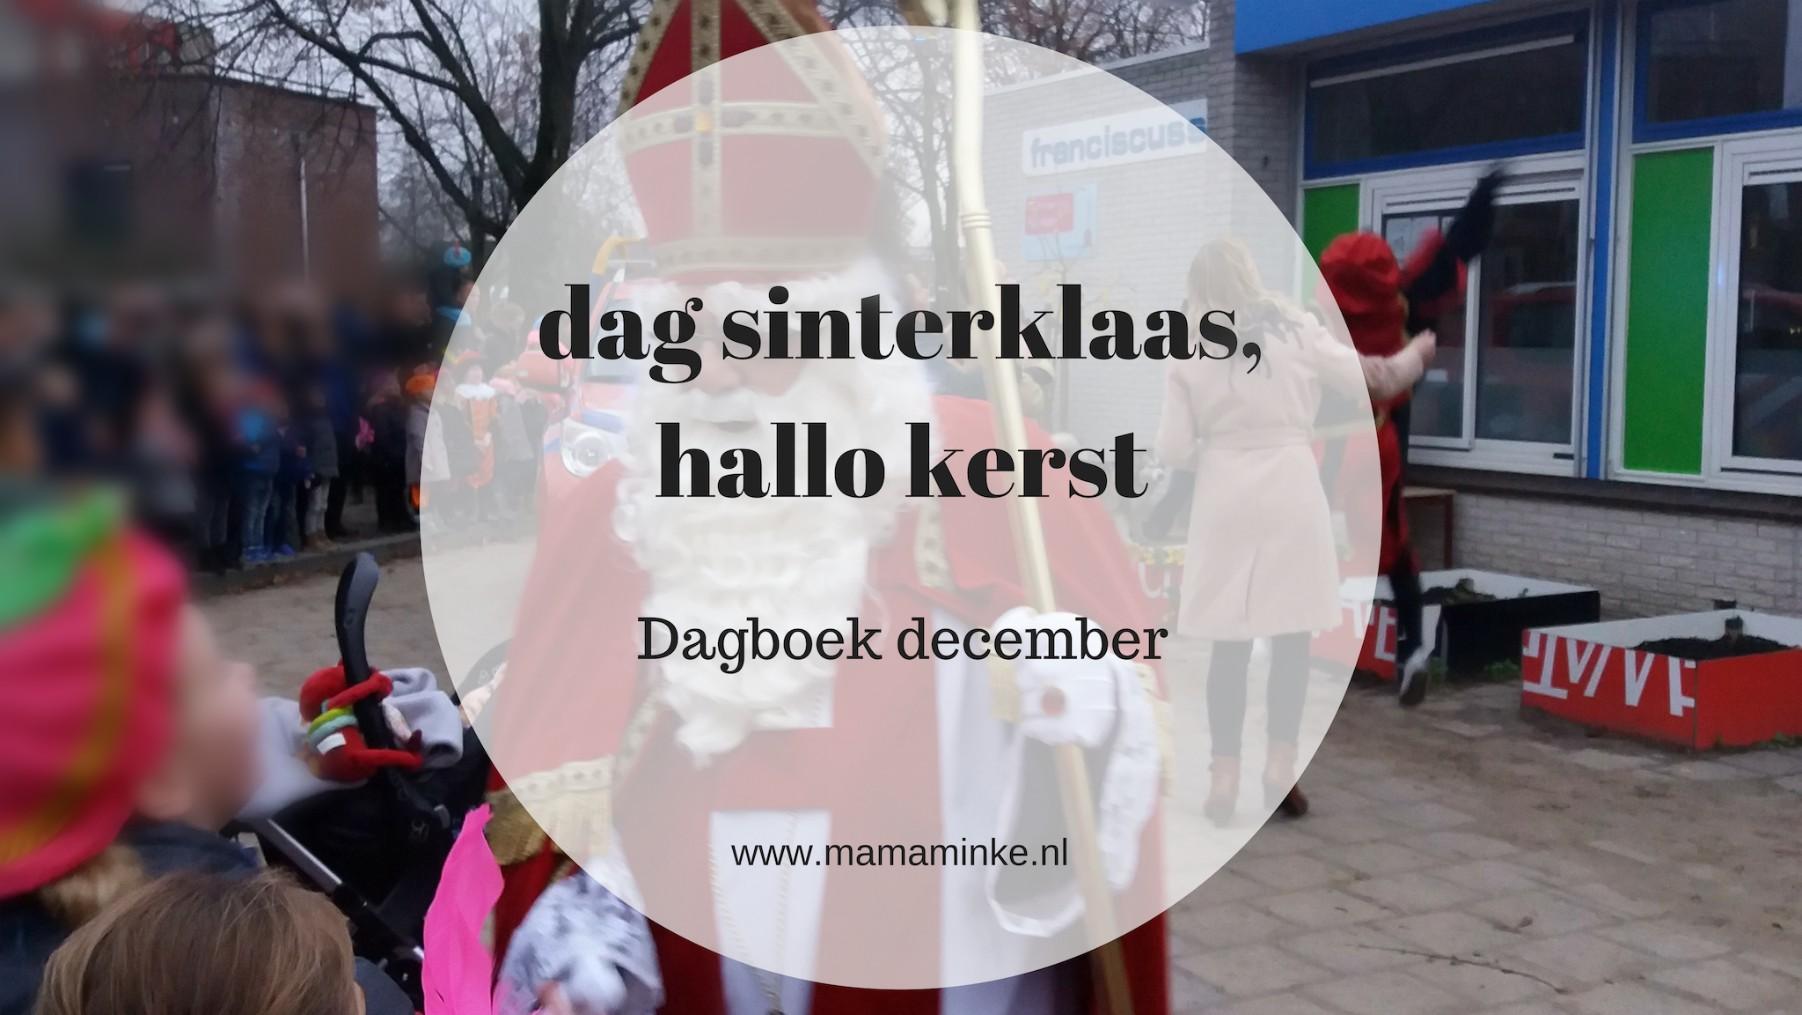 Dagboek: Dag Sinterklaasje, hallo kerst!